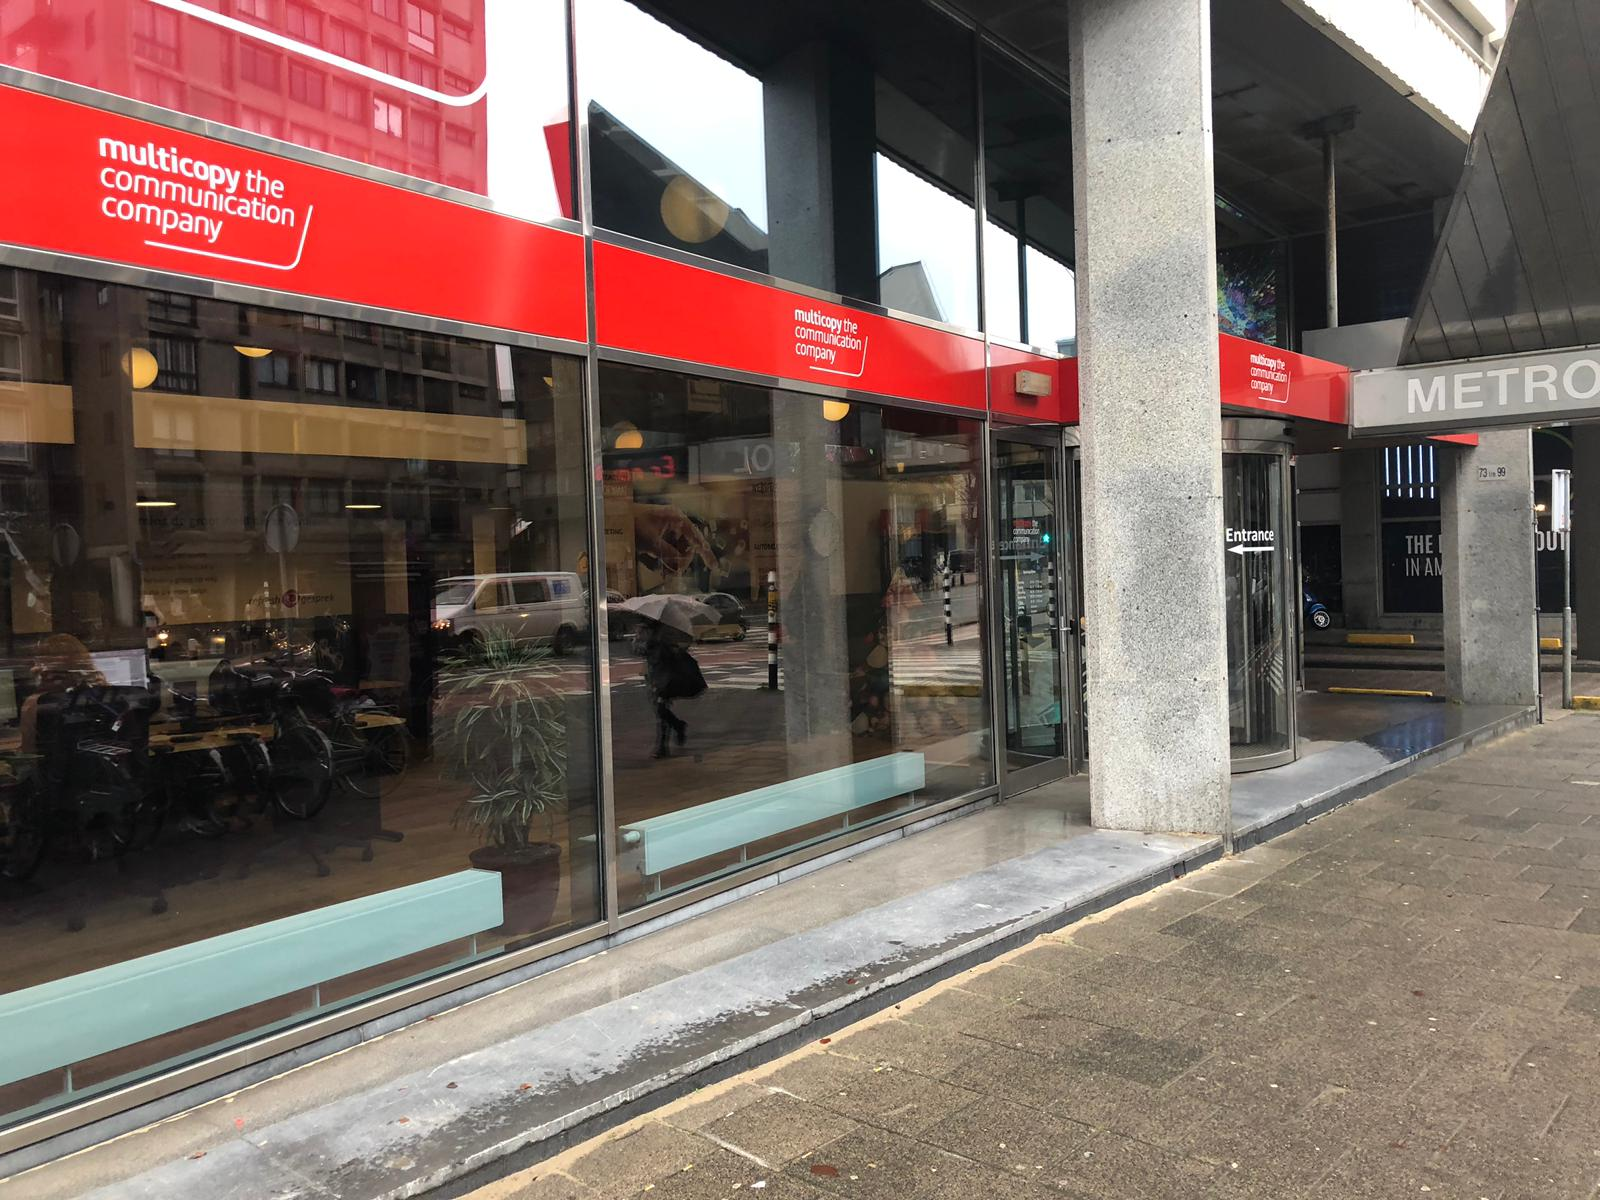 Multicopy The Communication Company | Amsterdam Centrum